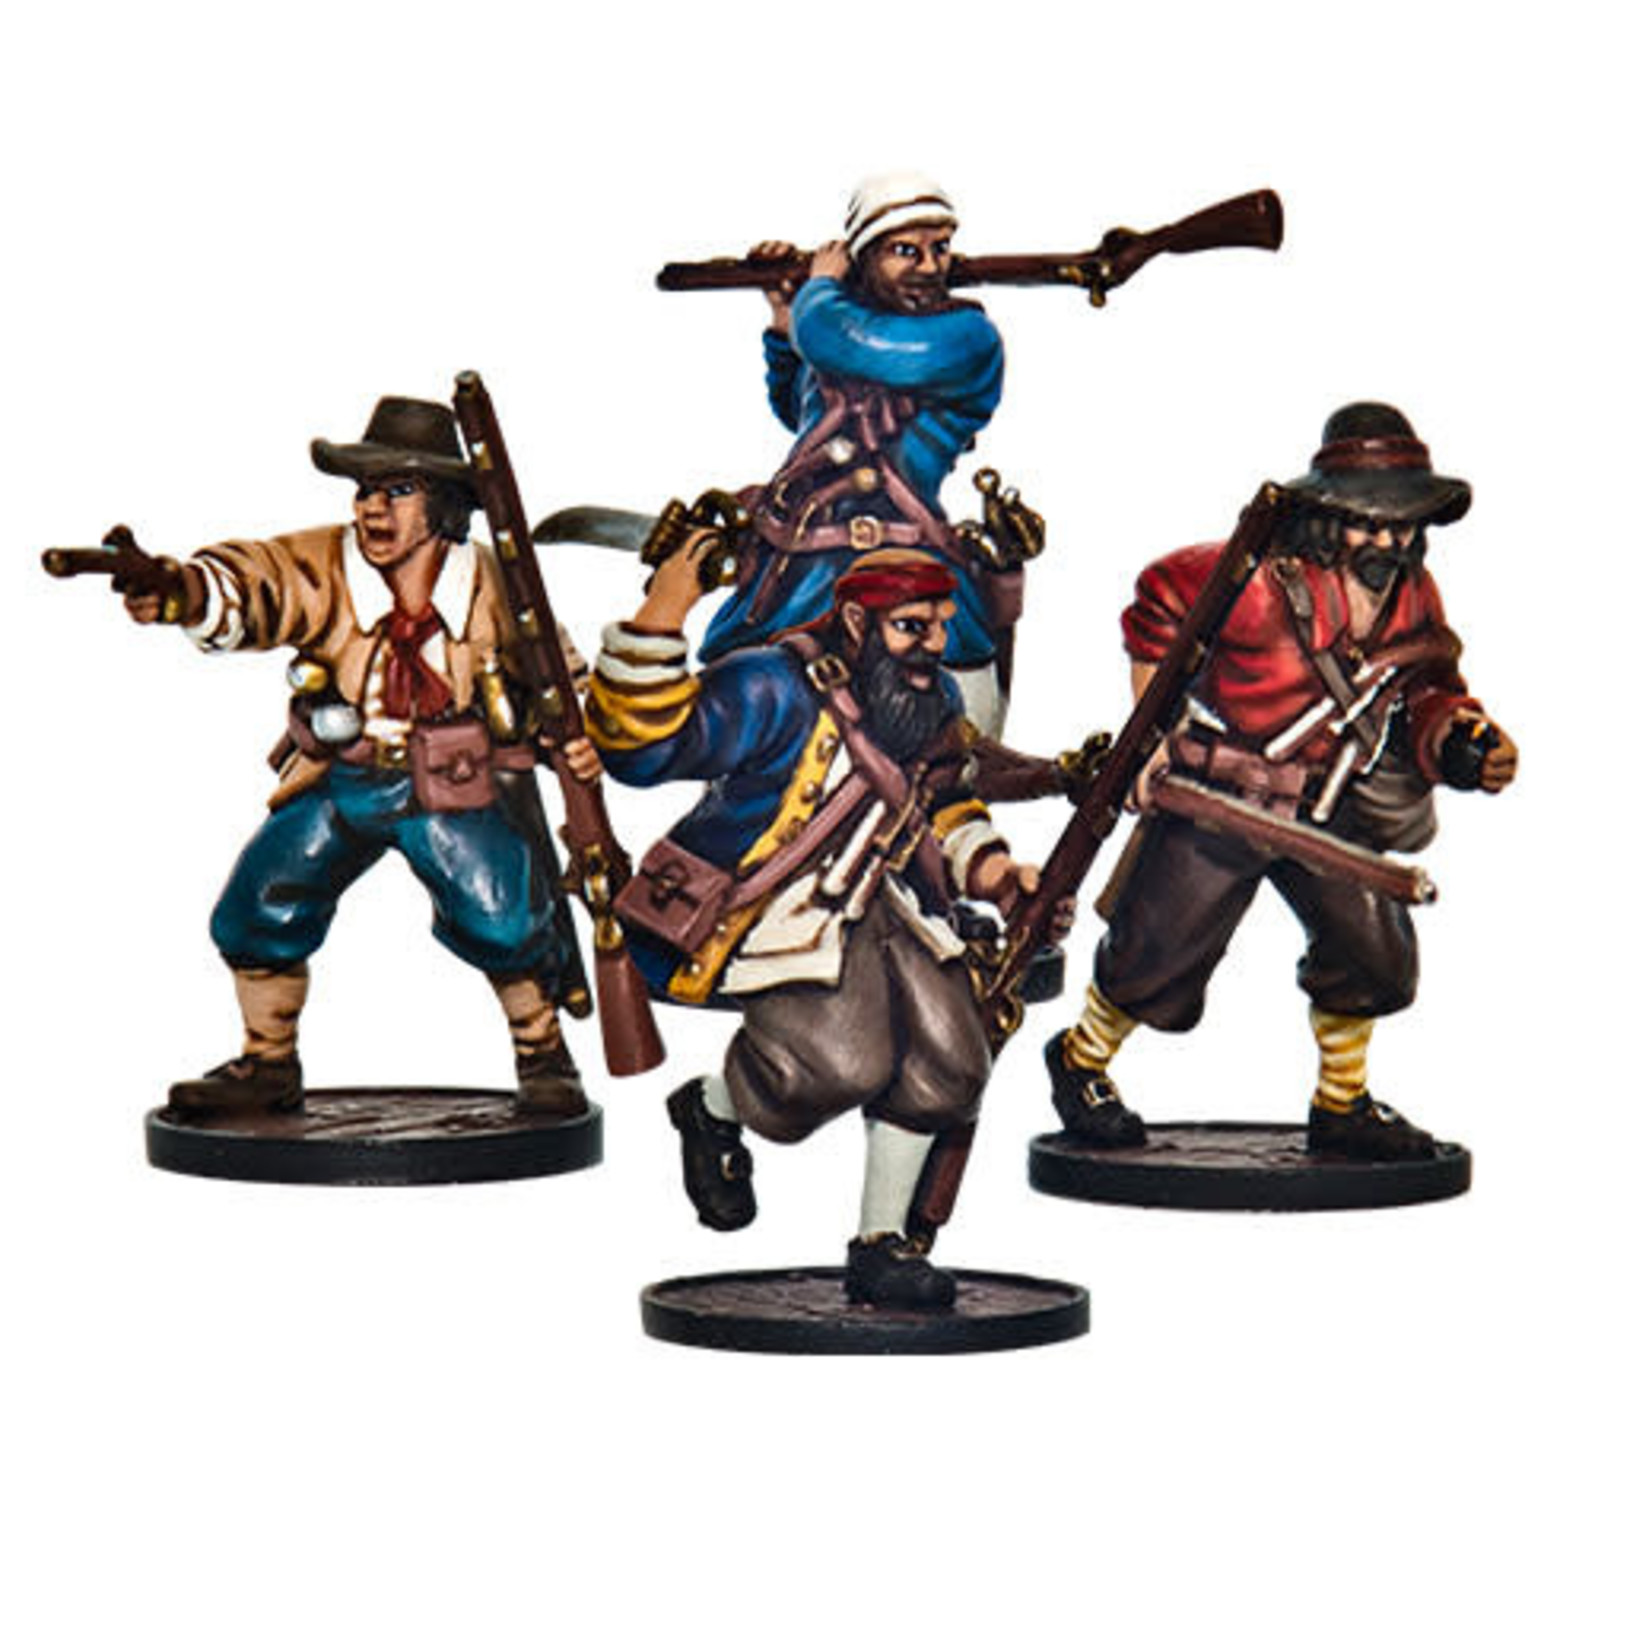 Forlorn Hope Unit (Buccaneer Storming Party Unit)